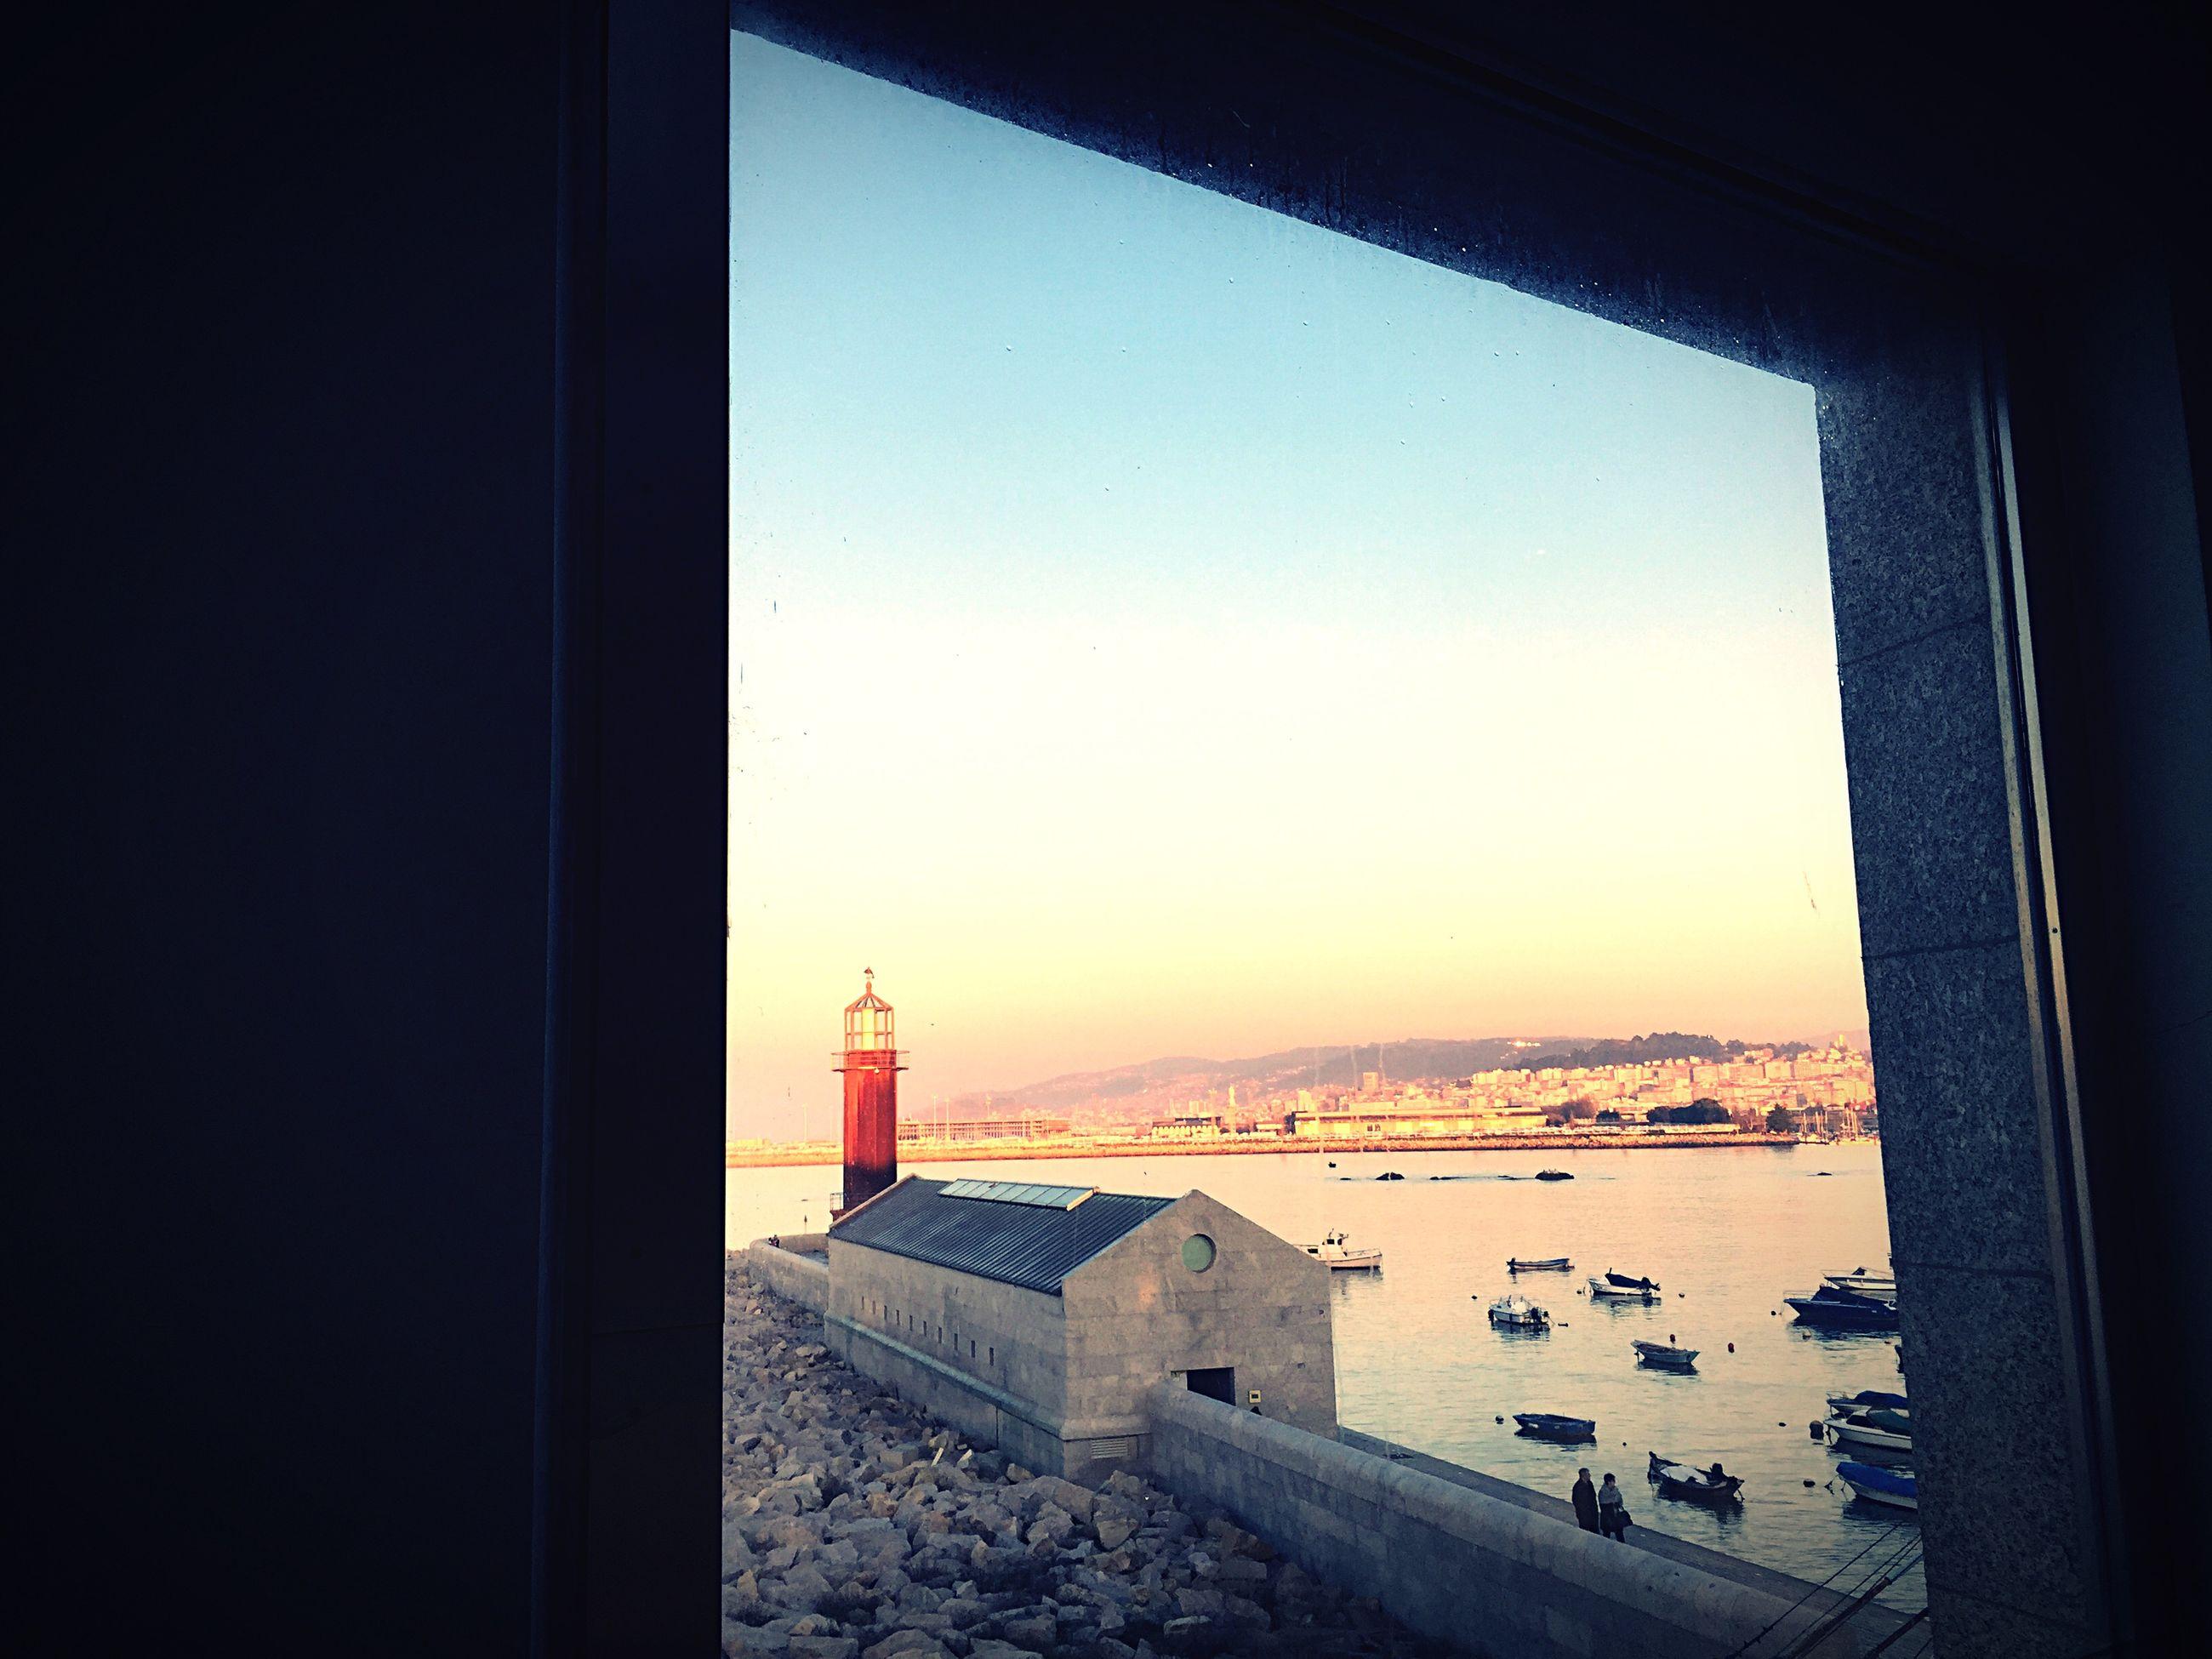 Sea by city against clear sky seen through window